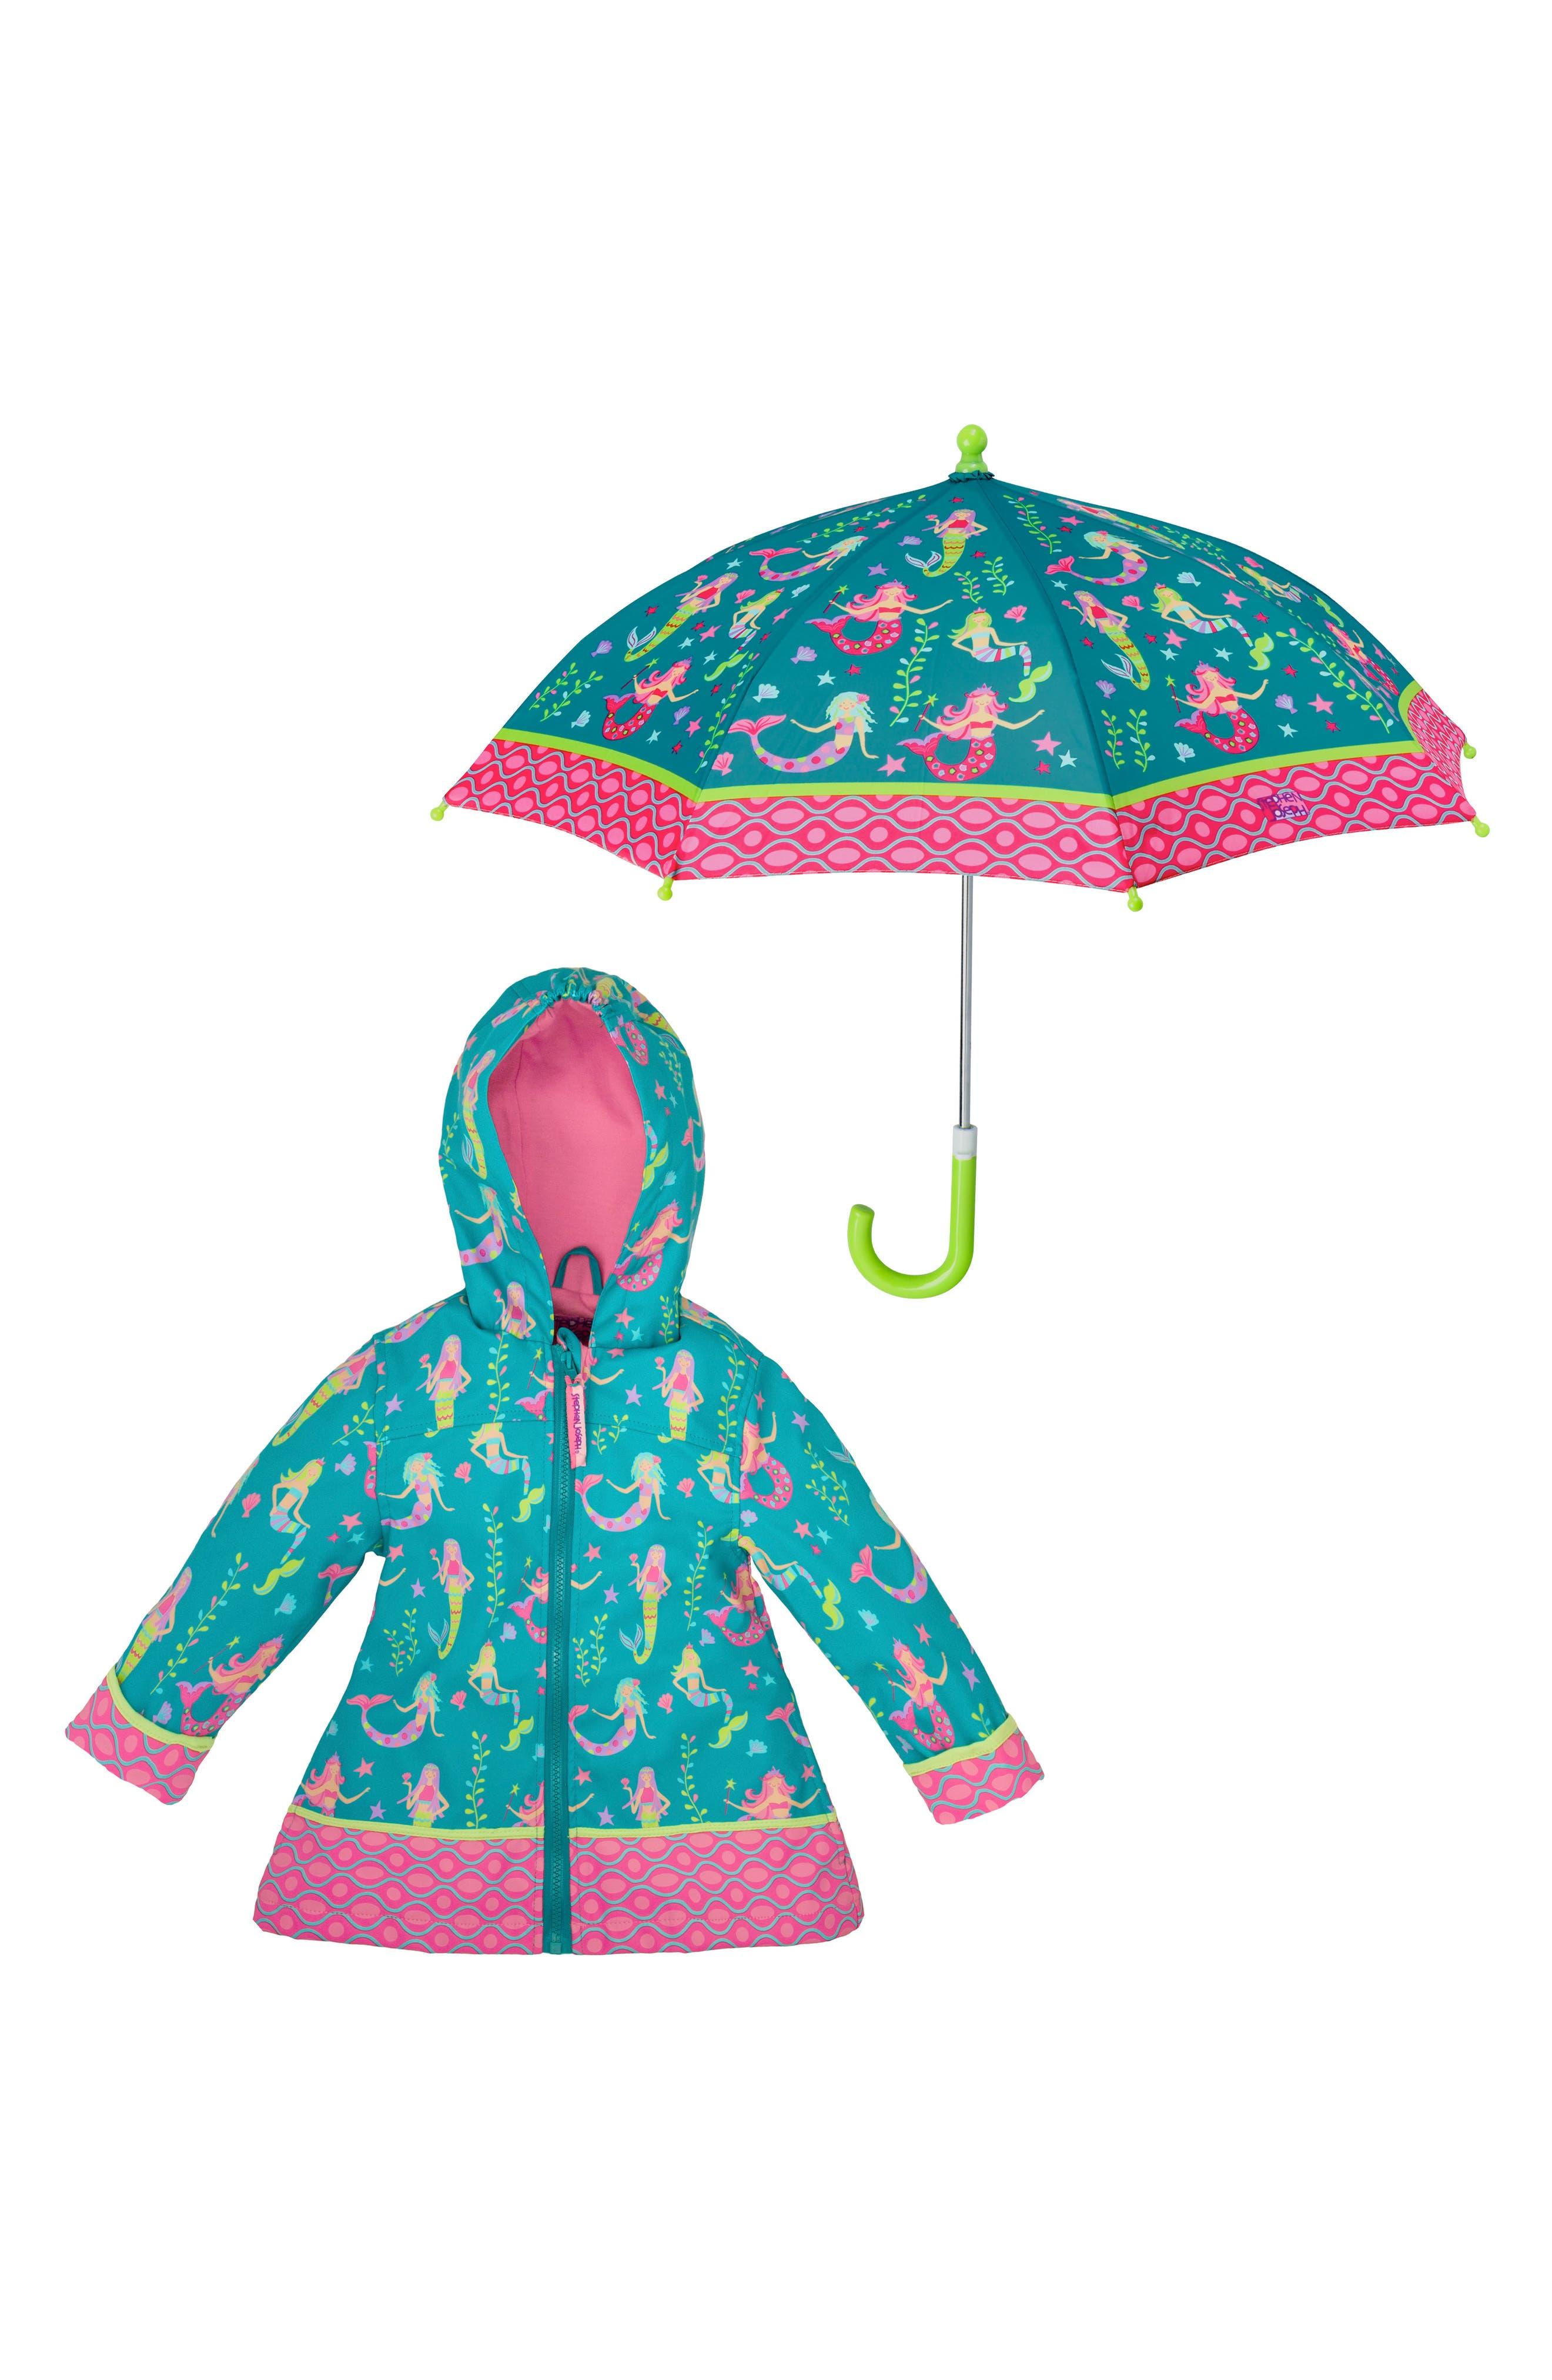 Main Image - Stephen Joseph Mermaid Raincoat & Umbrella Set (Toddler Girls, Little Girls & Big Girls)